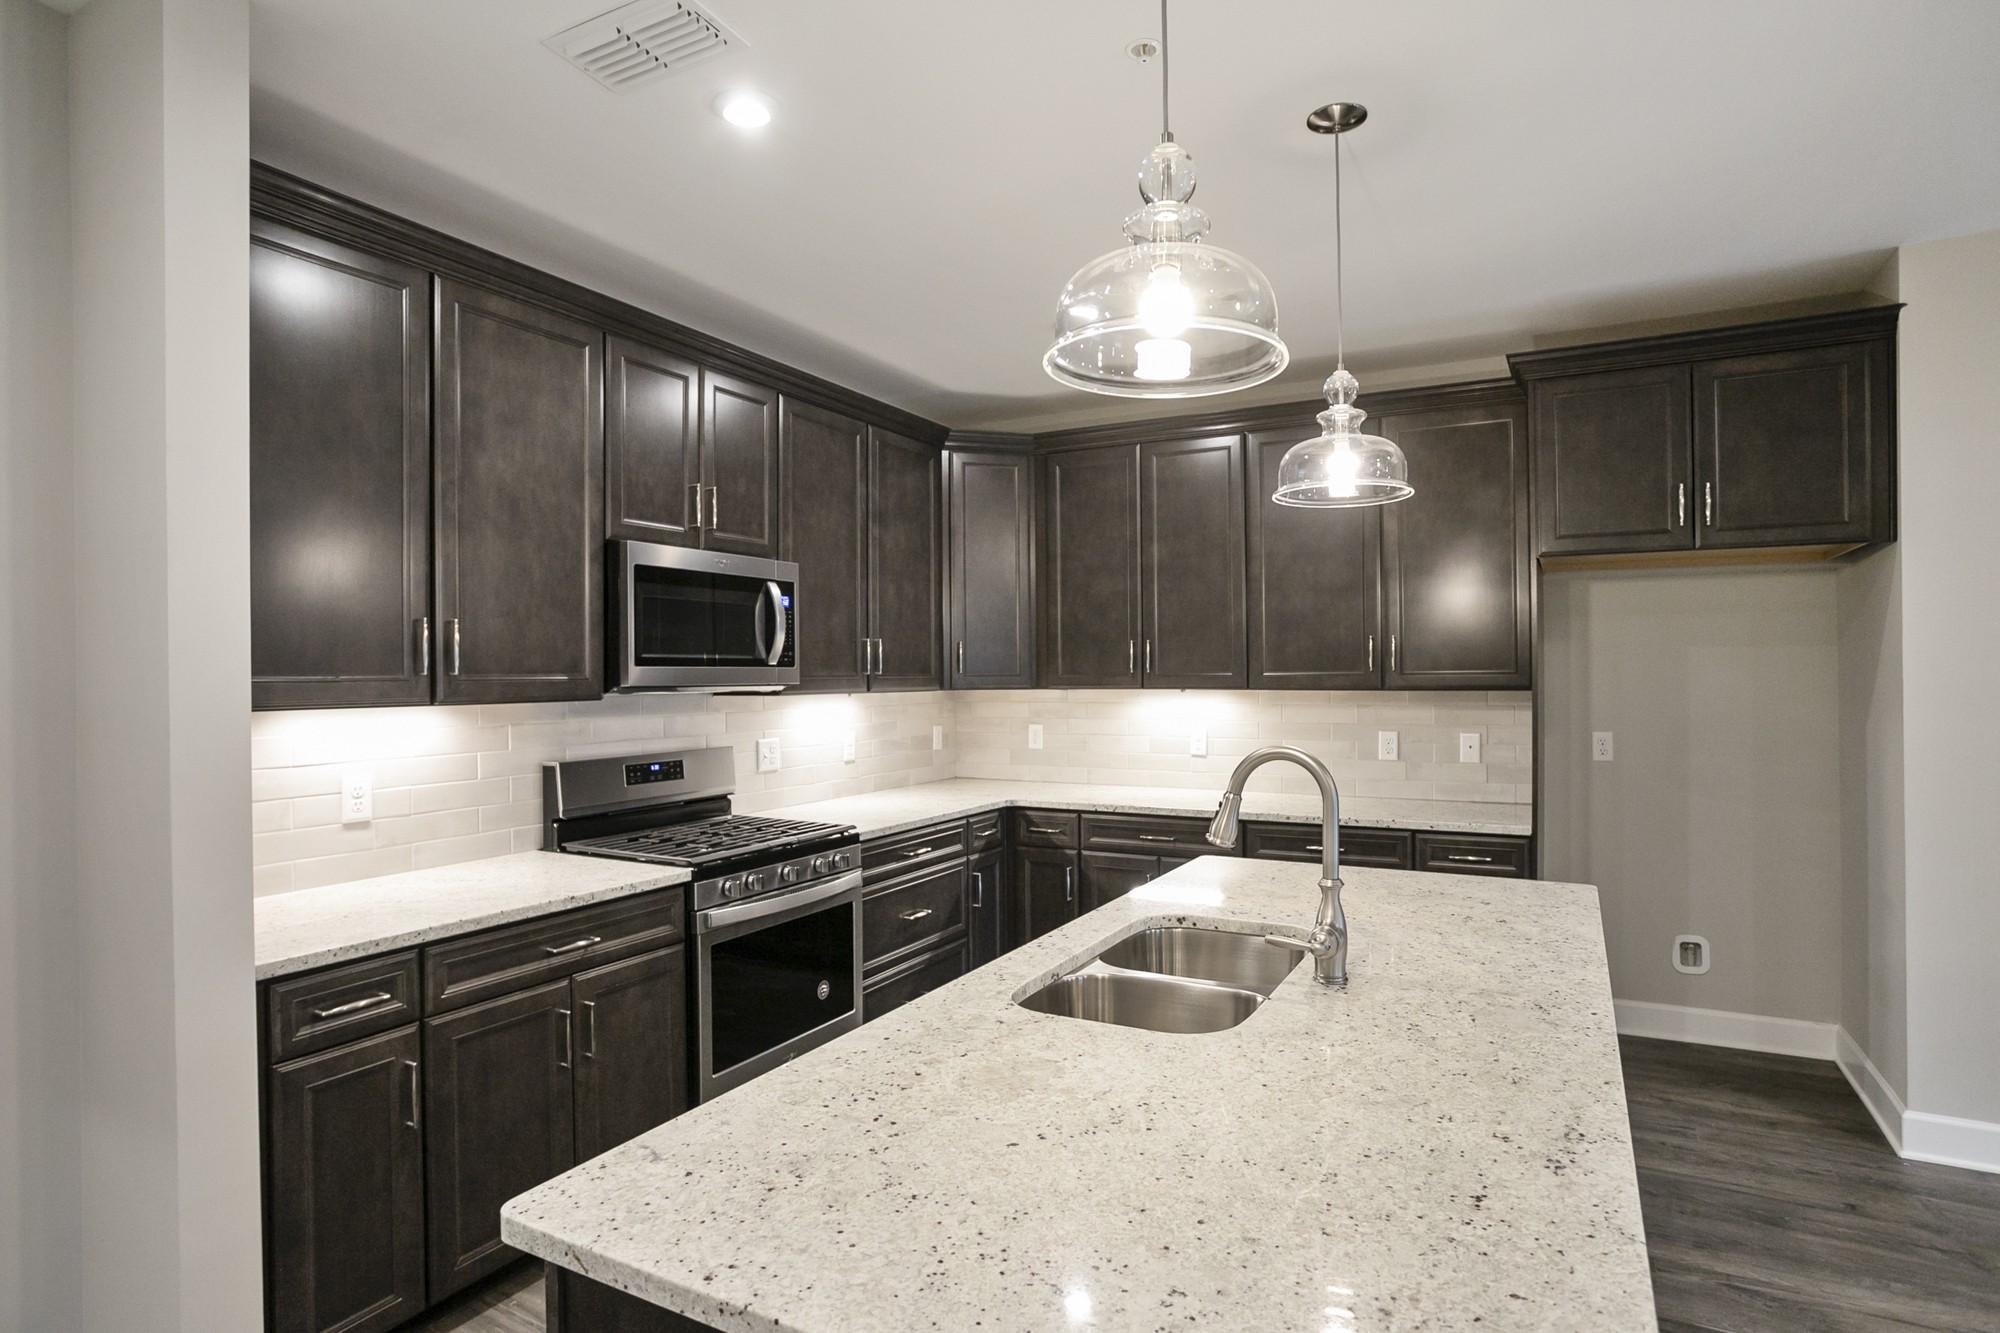 141 Saundersville Road #2205 Property Photo - Hendersonville, TN real estate listing